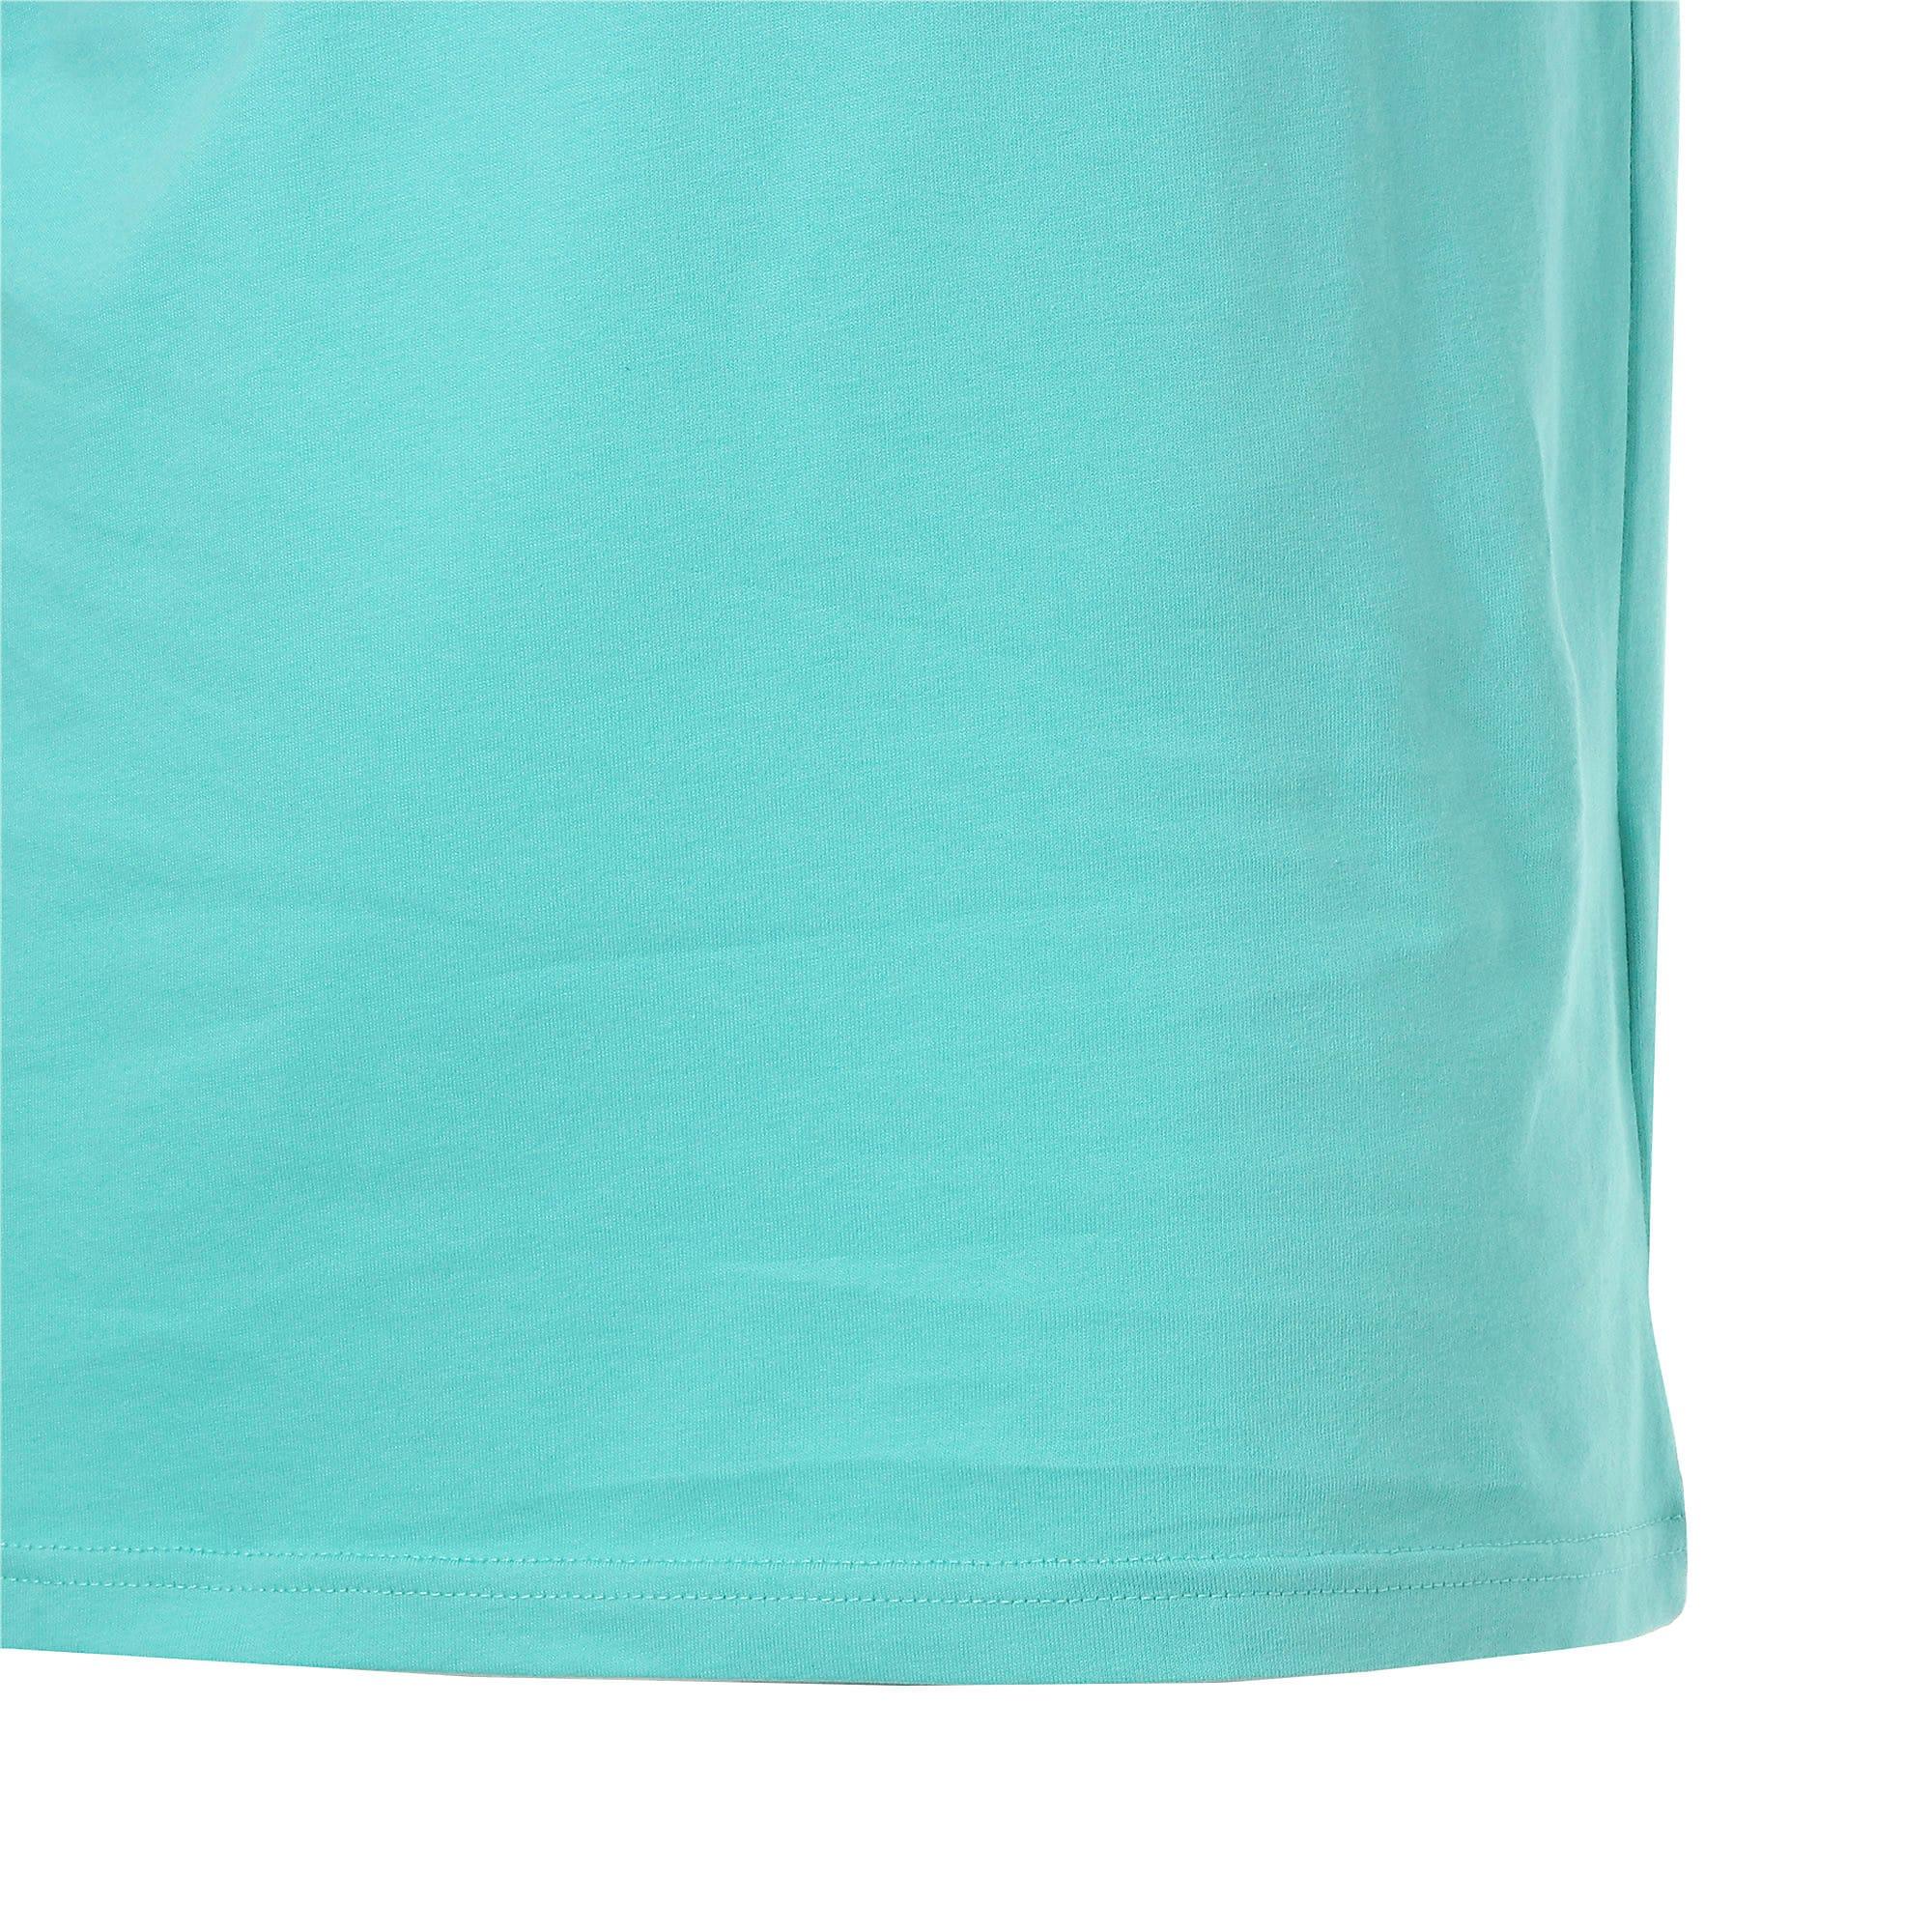 Thumbnail 8 of PUMA XTG SS Tシャツ 半袖, Blue Turquoise, medium-JPN